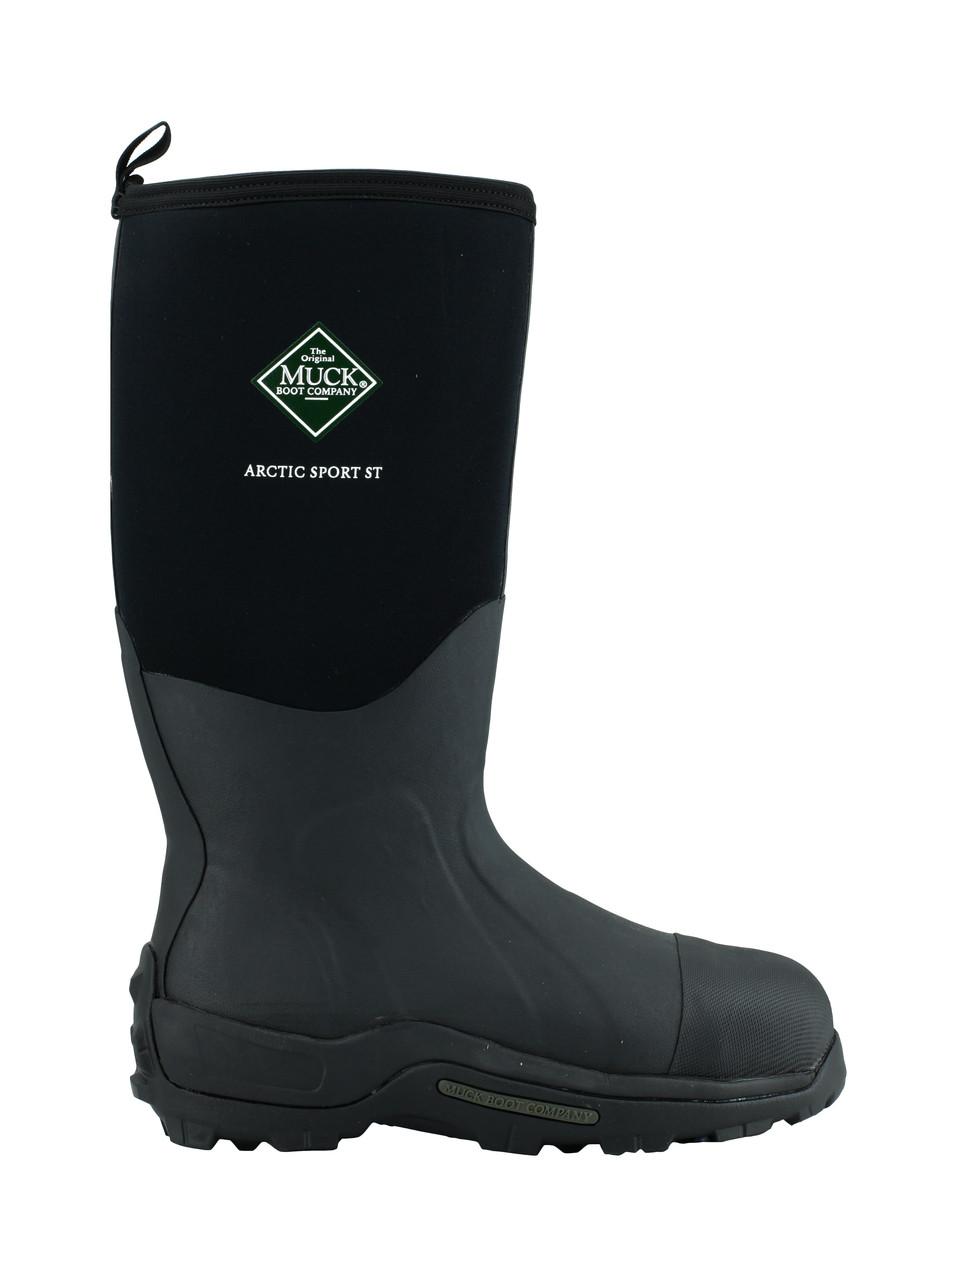 Muck Boots Arctic Sport Steel Toe - ASP